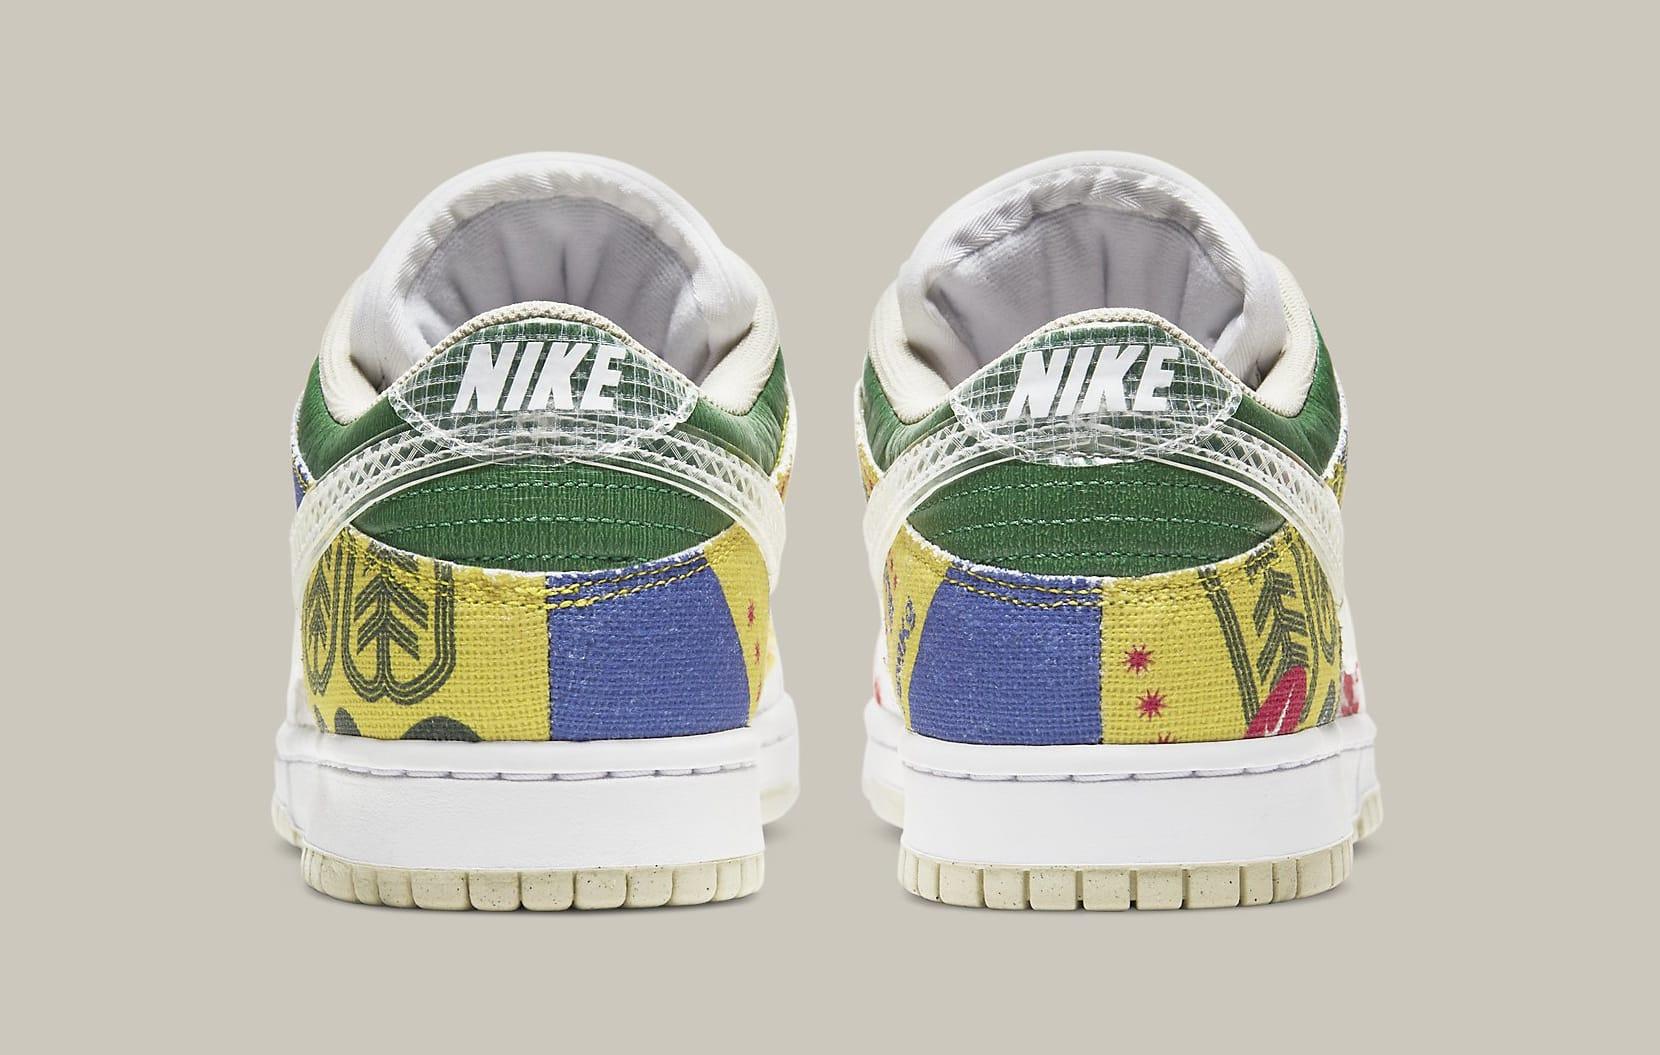 Nike Dunk Low 'City Market' DA6125-900 Heel